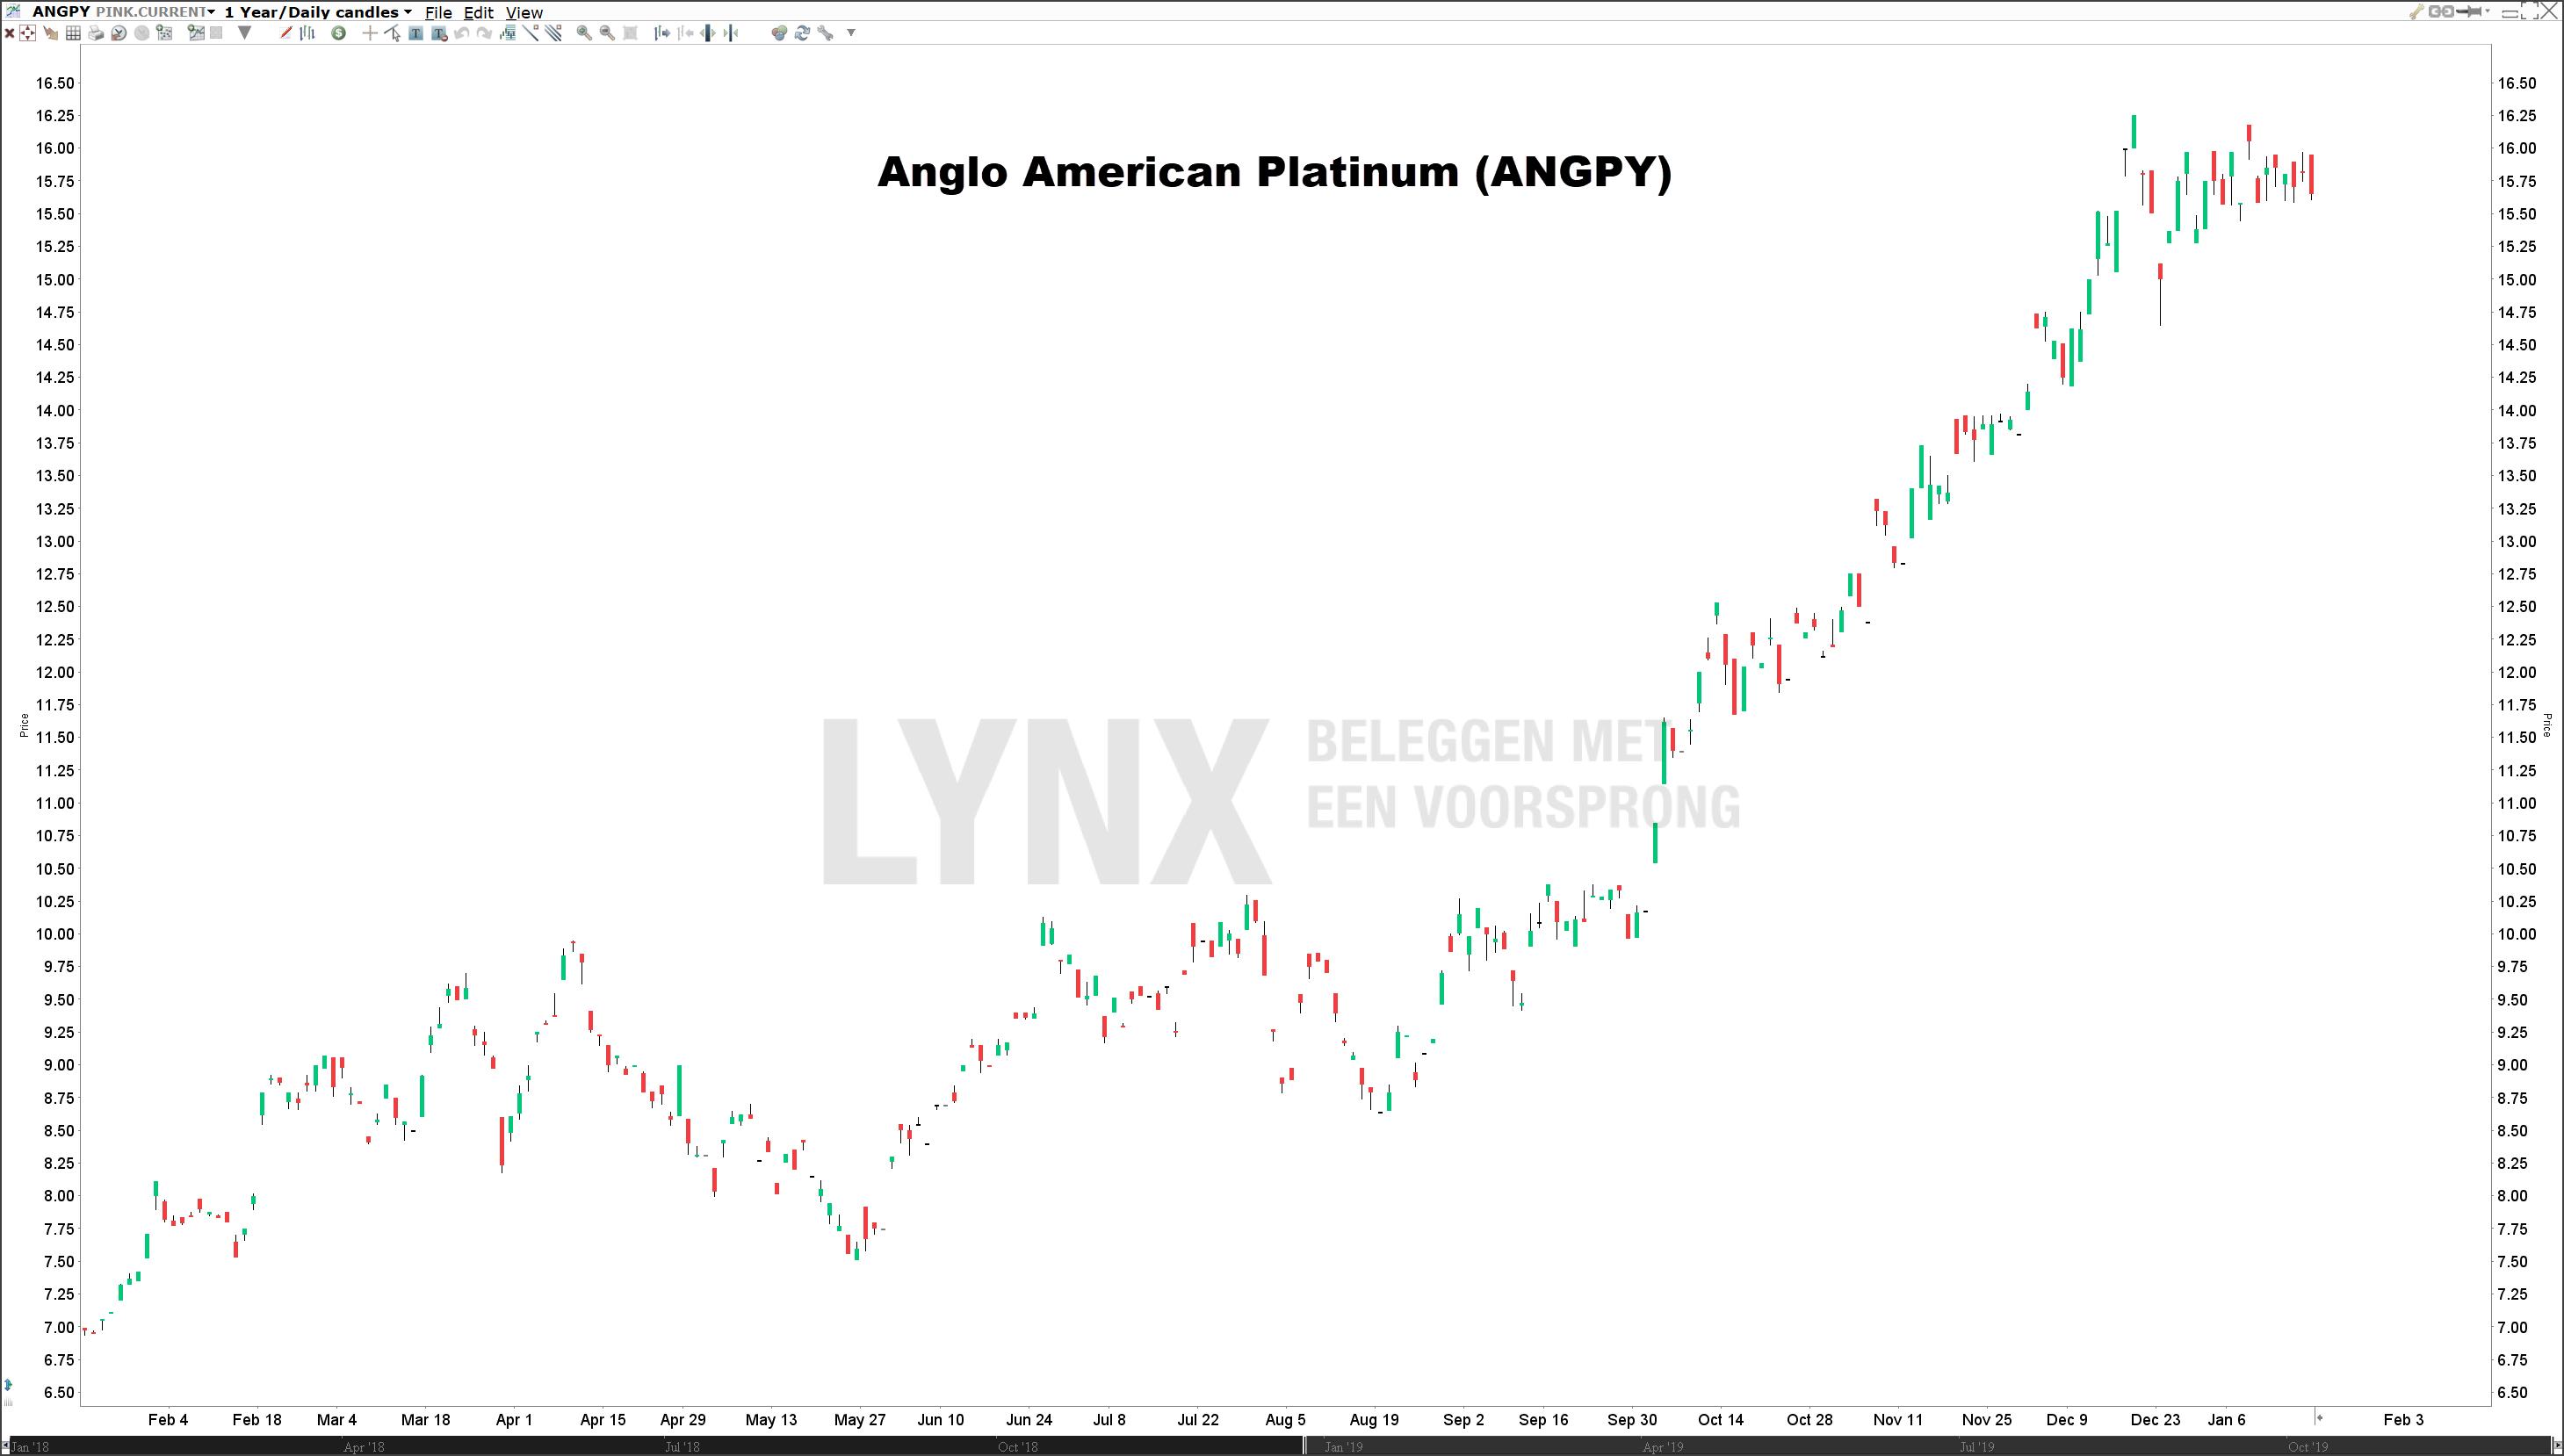 Koers Anglo American Platinum